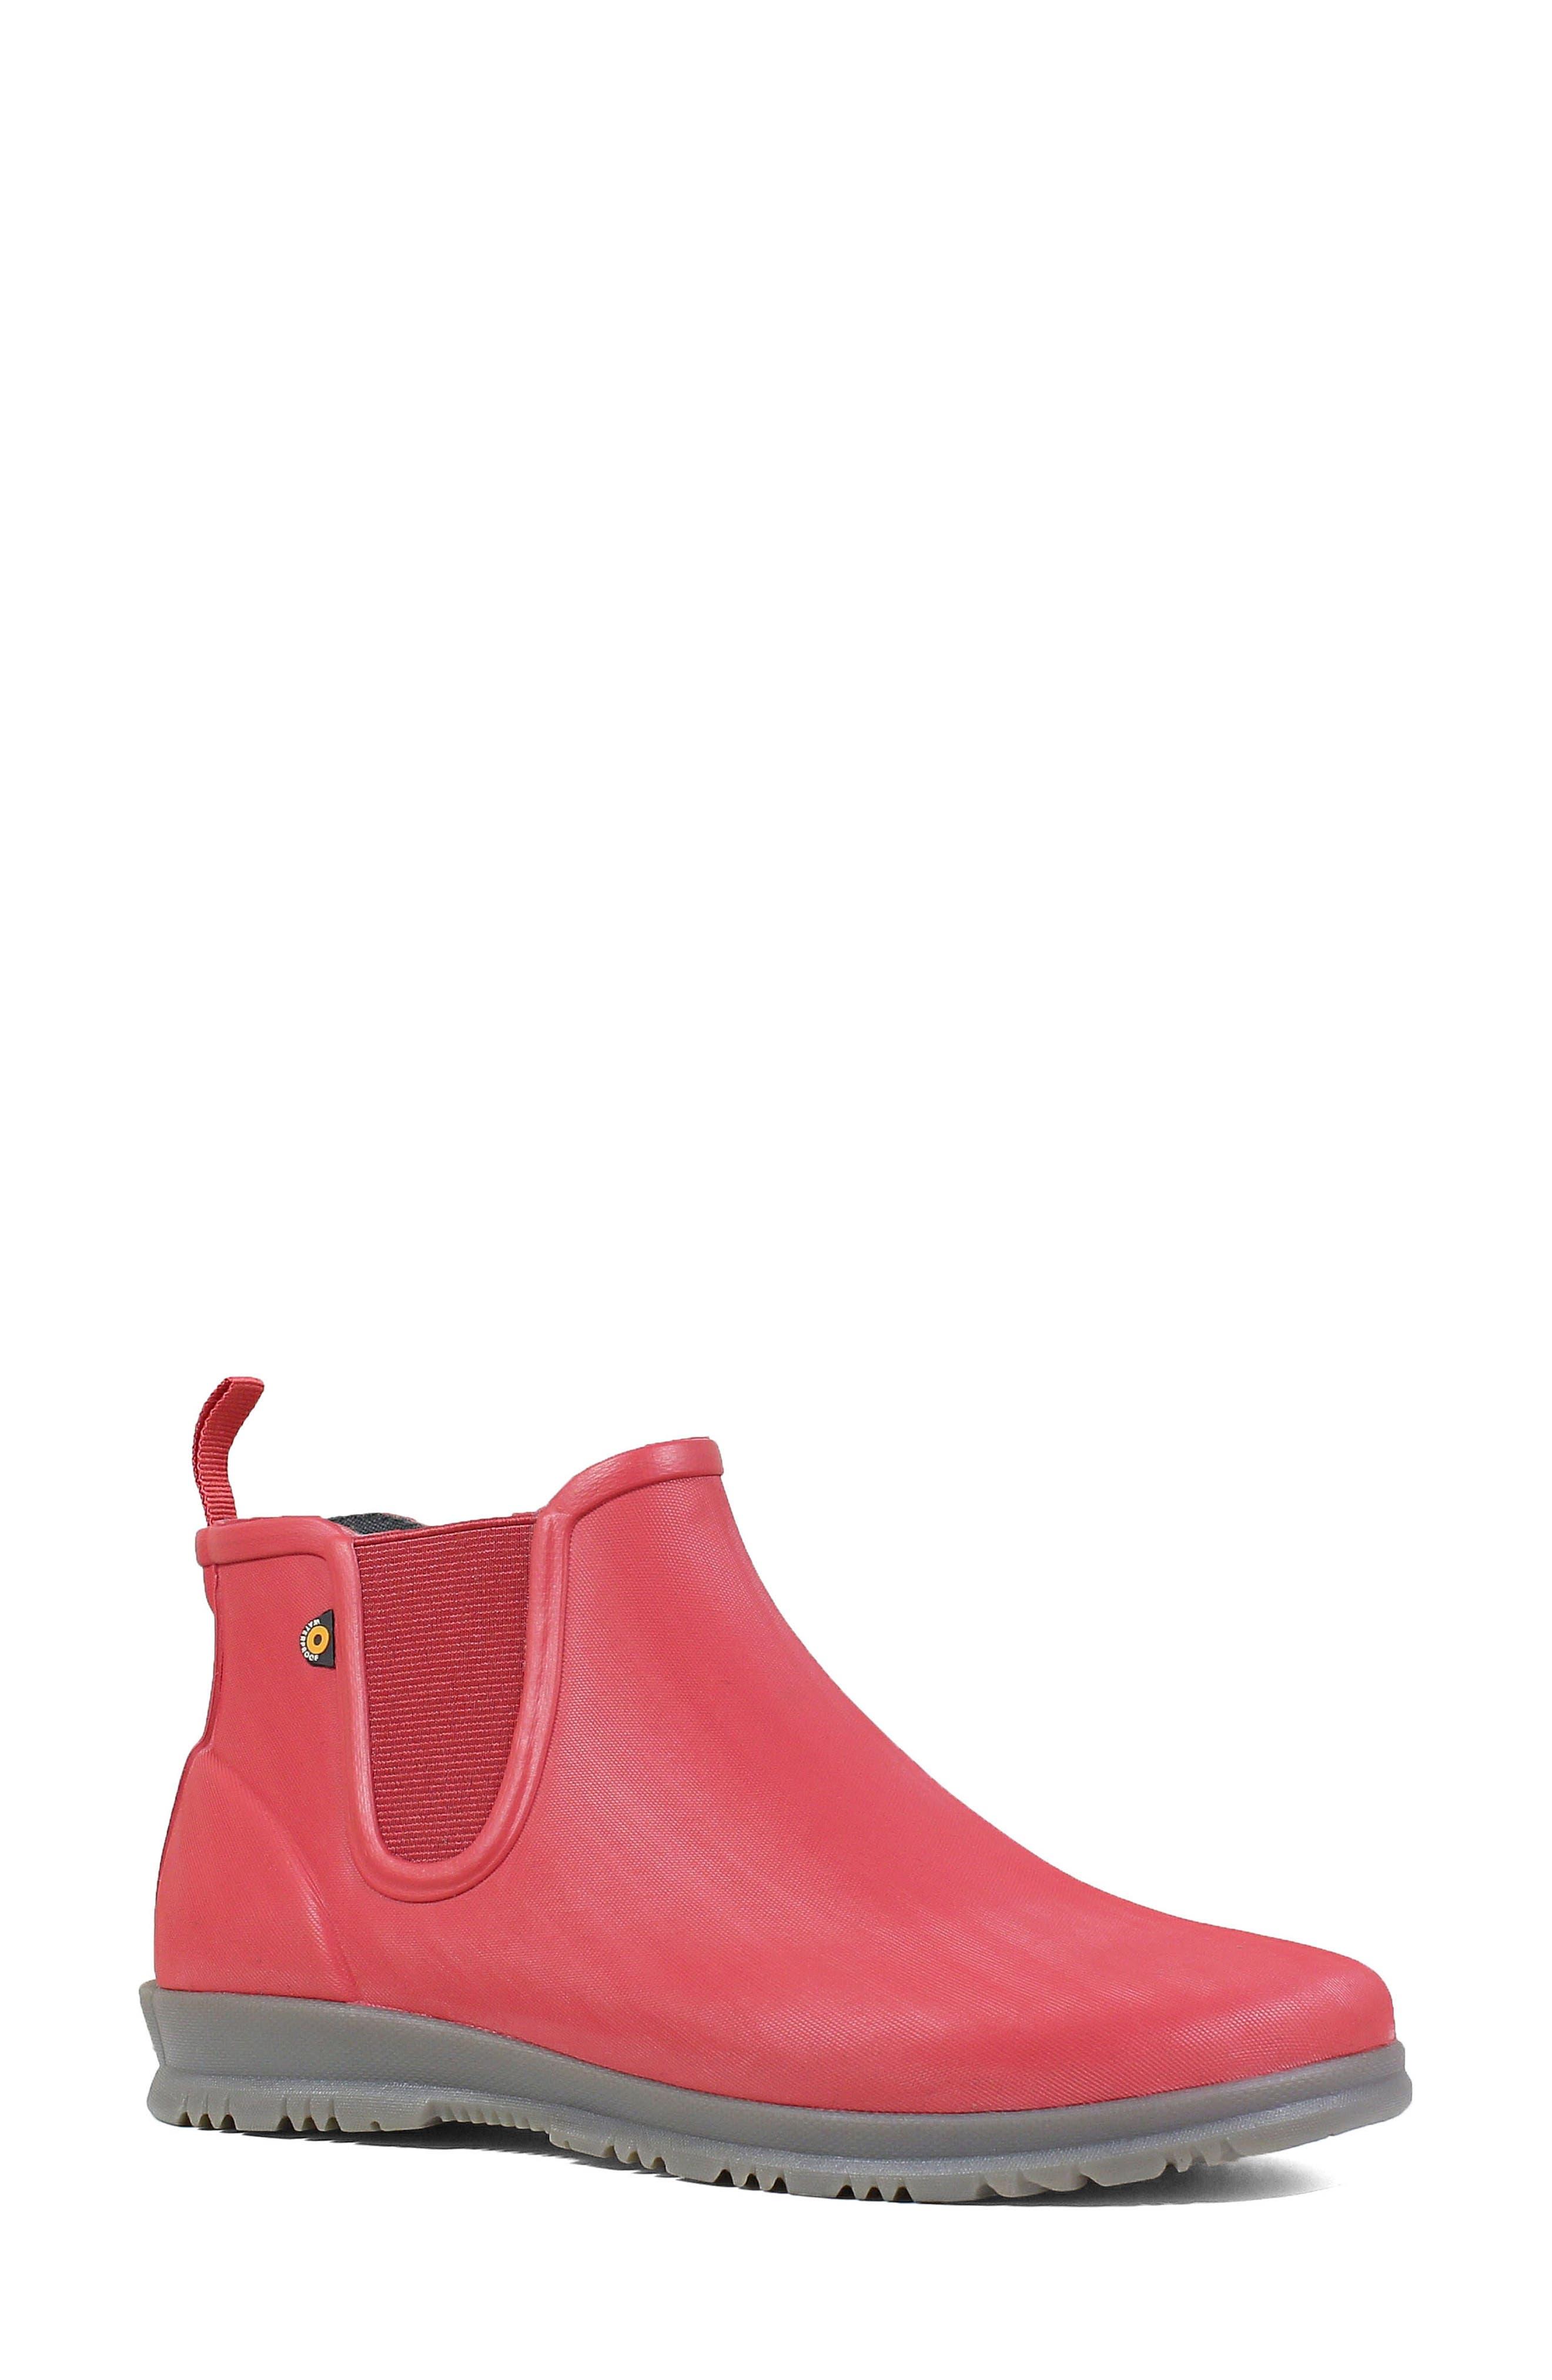 Bogs Sweetpea Rain Boot, Red